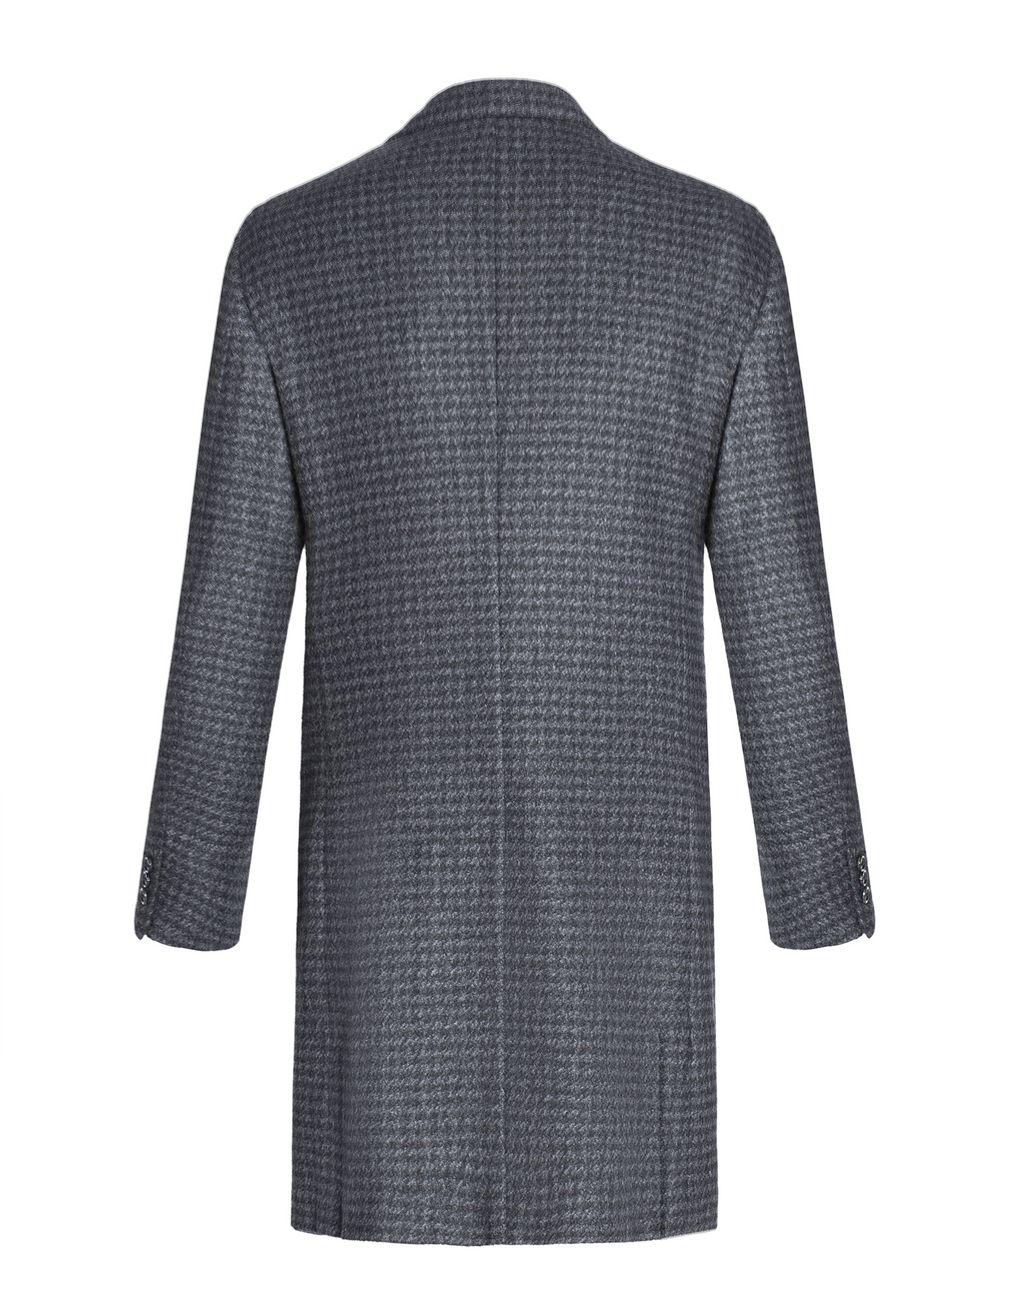 BRIONI Grey Macro Pied de Poule Plume Coat in Cashmere Outerwear U r